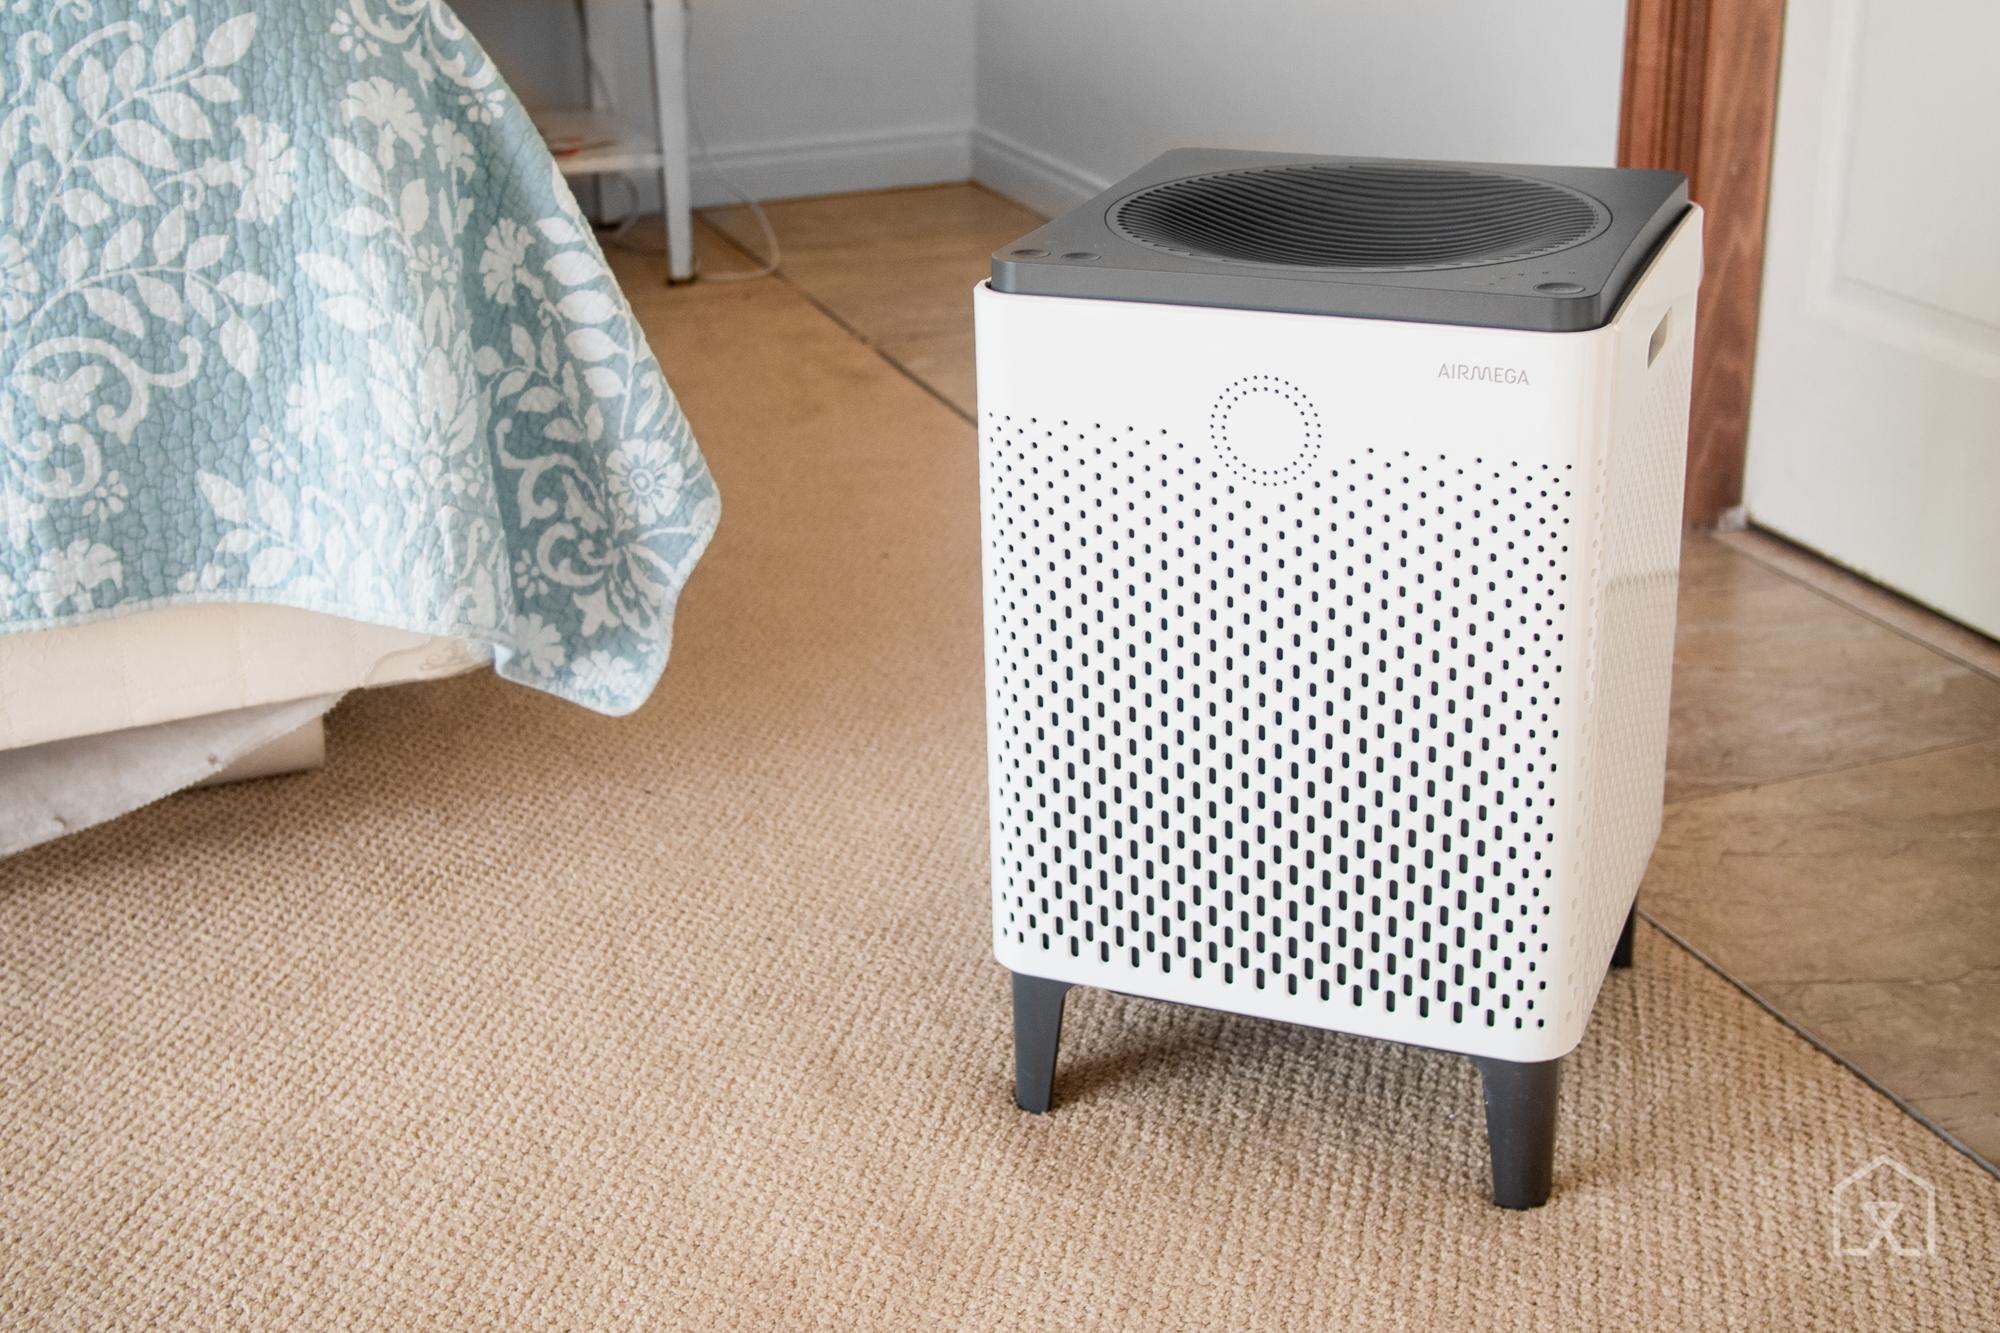 The best air purifier